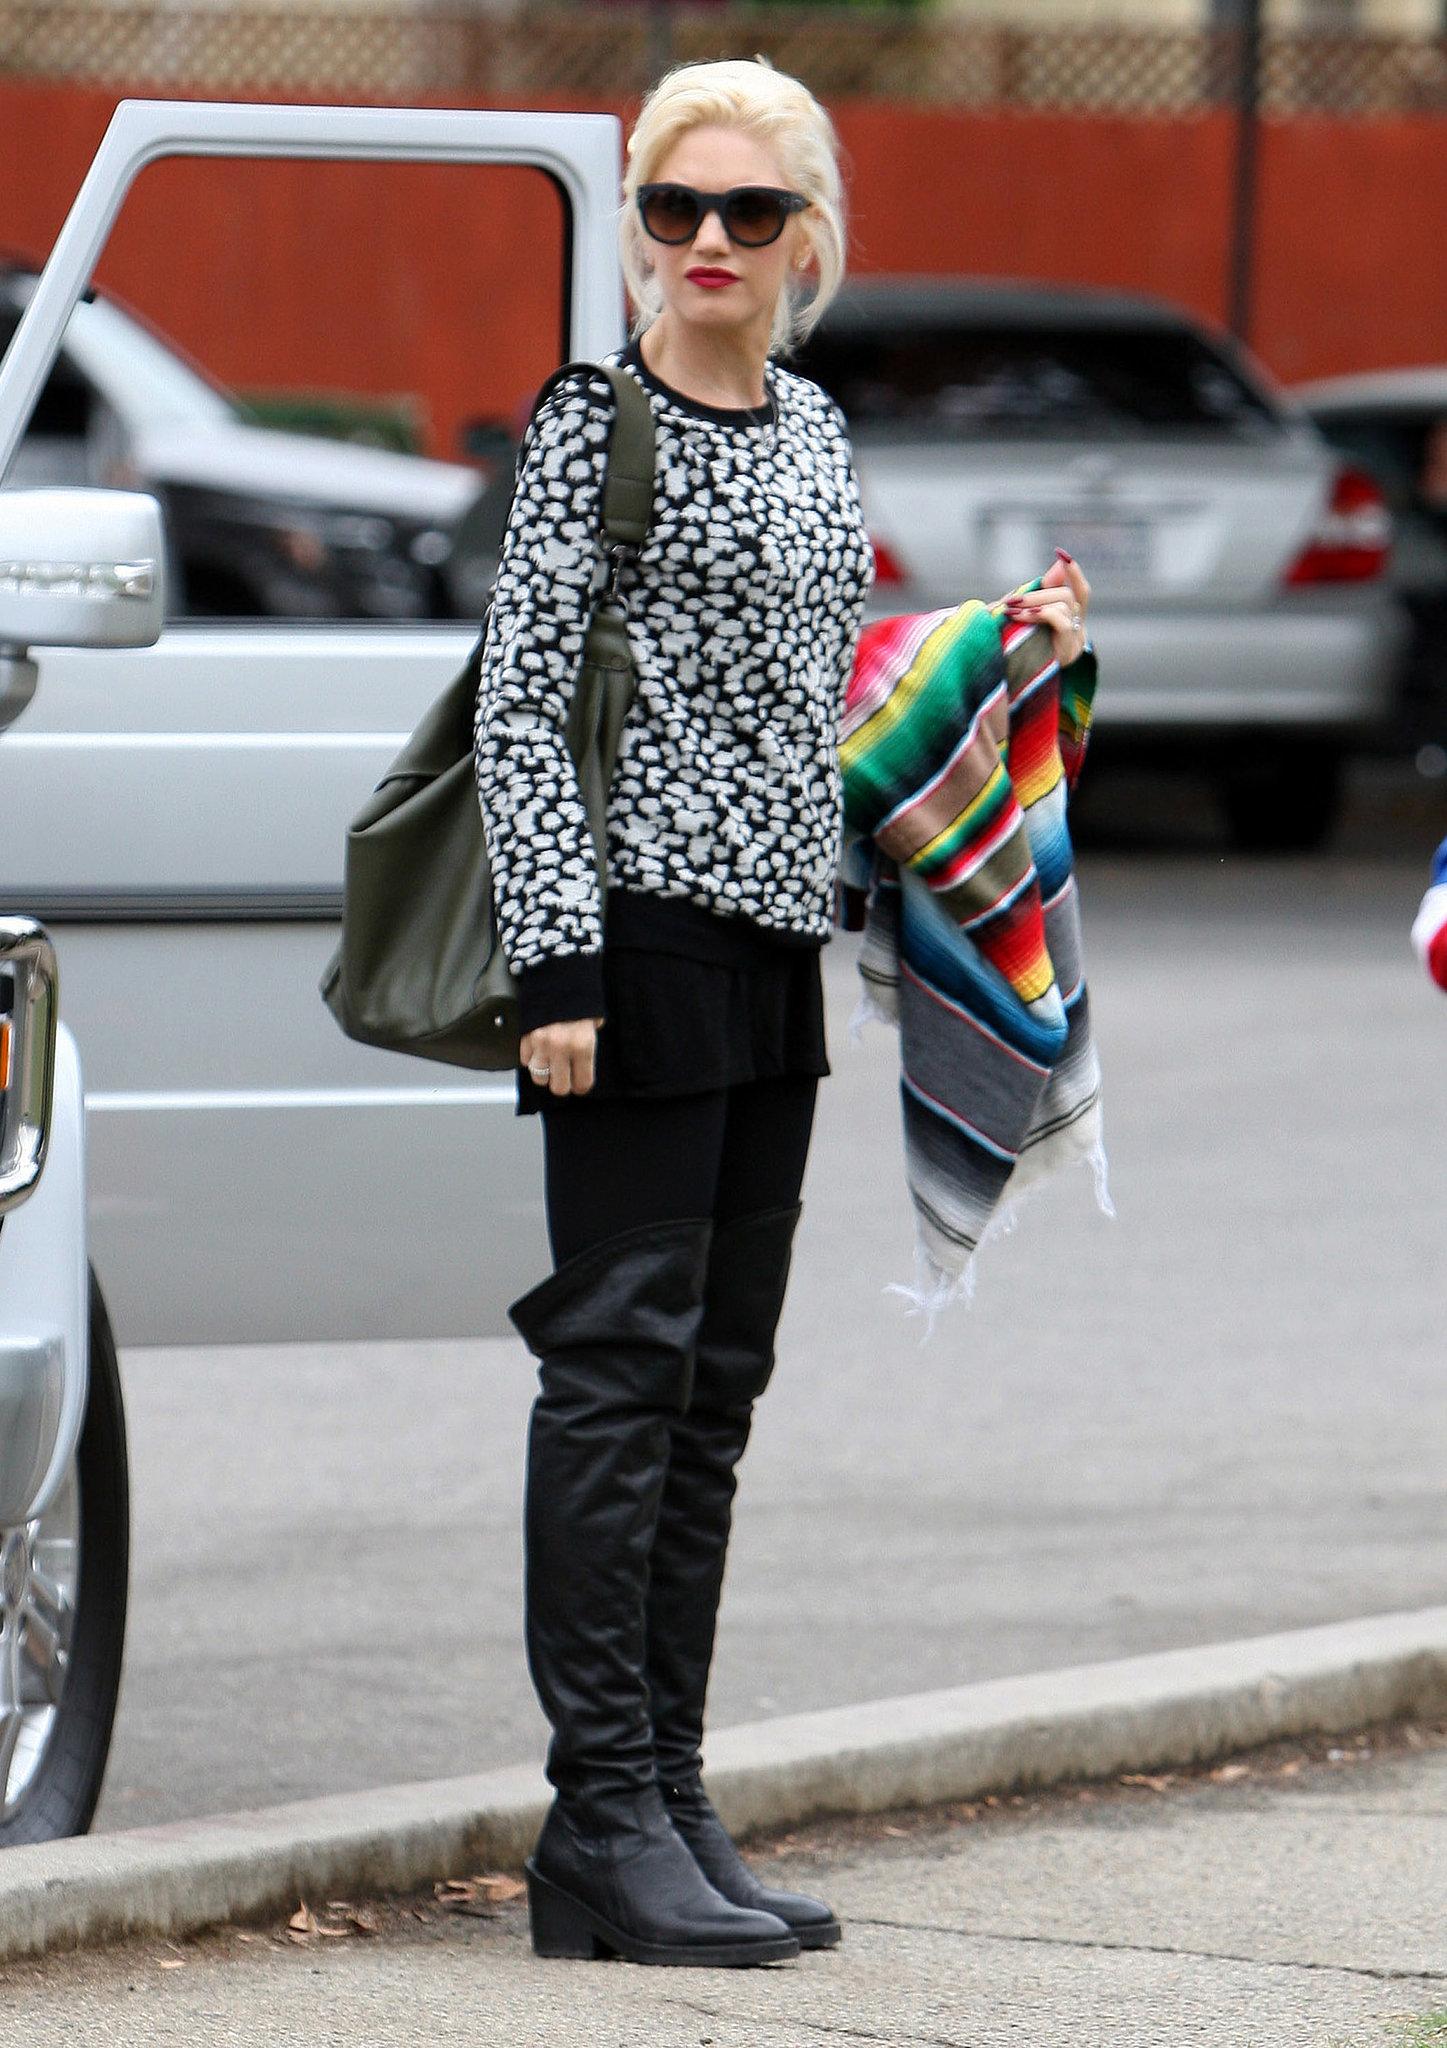 Gwen Stefani watched her son Kingston Rossdale's soccer game in LA.